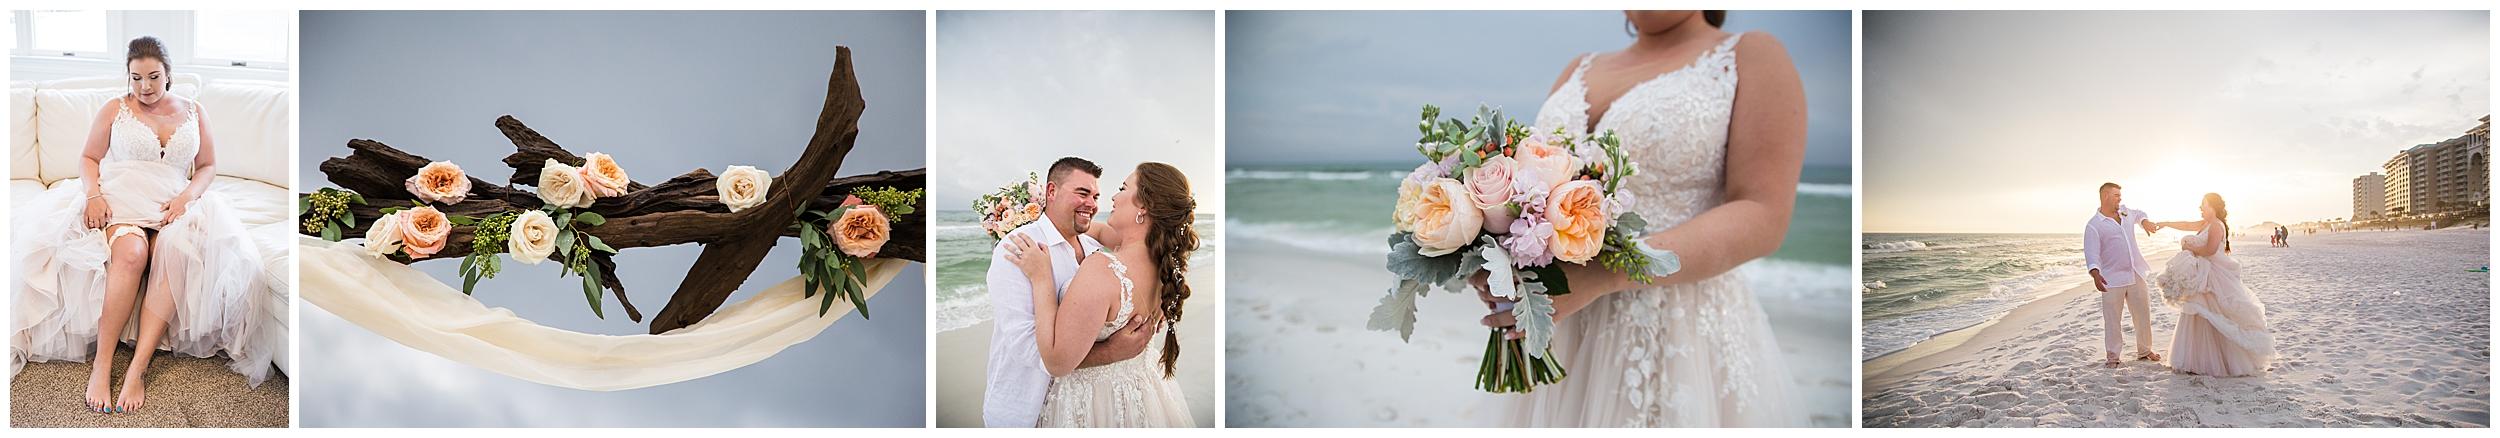 30a-Destin-Florida-Wedding-Photography-Jennie-Jeremy_0048.jpg